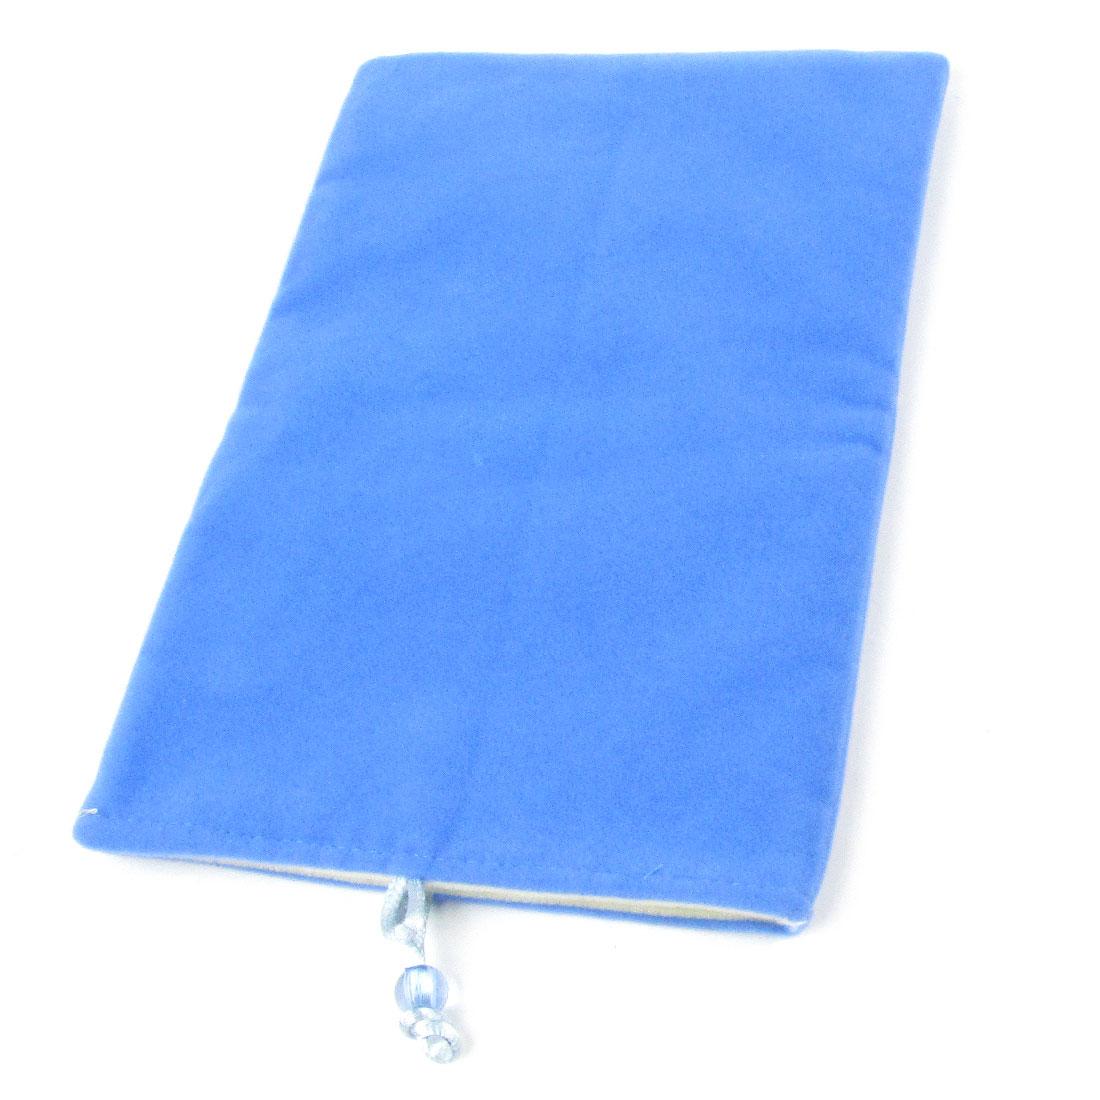 Bead Closure Velvet Phone Pouch Bag Case Blue for Cell Phone